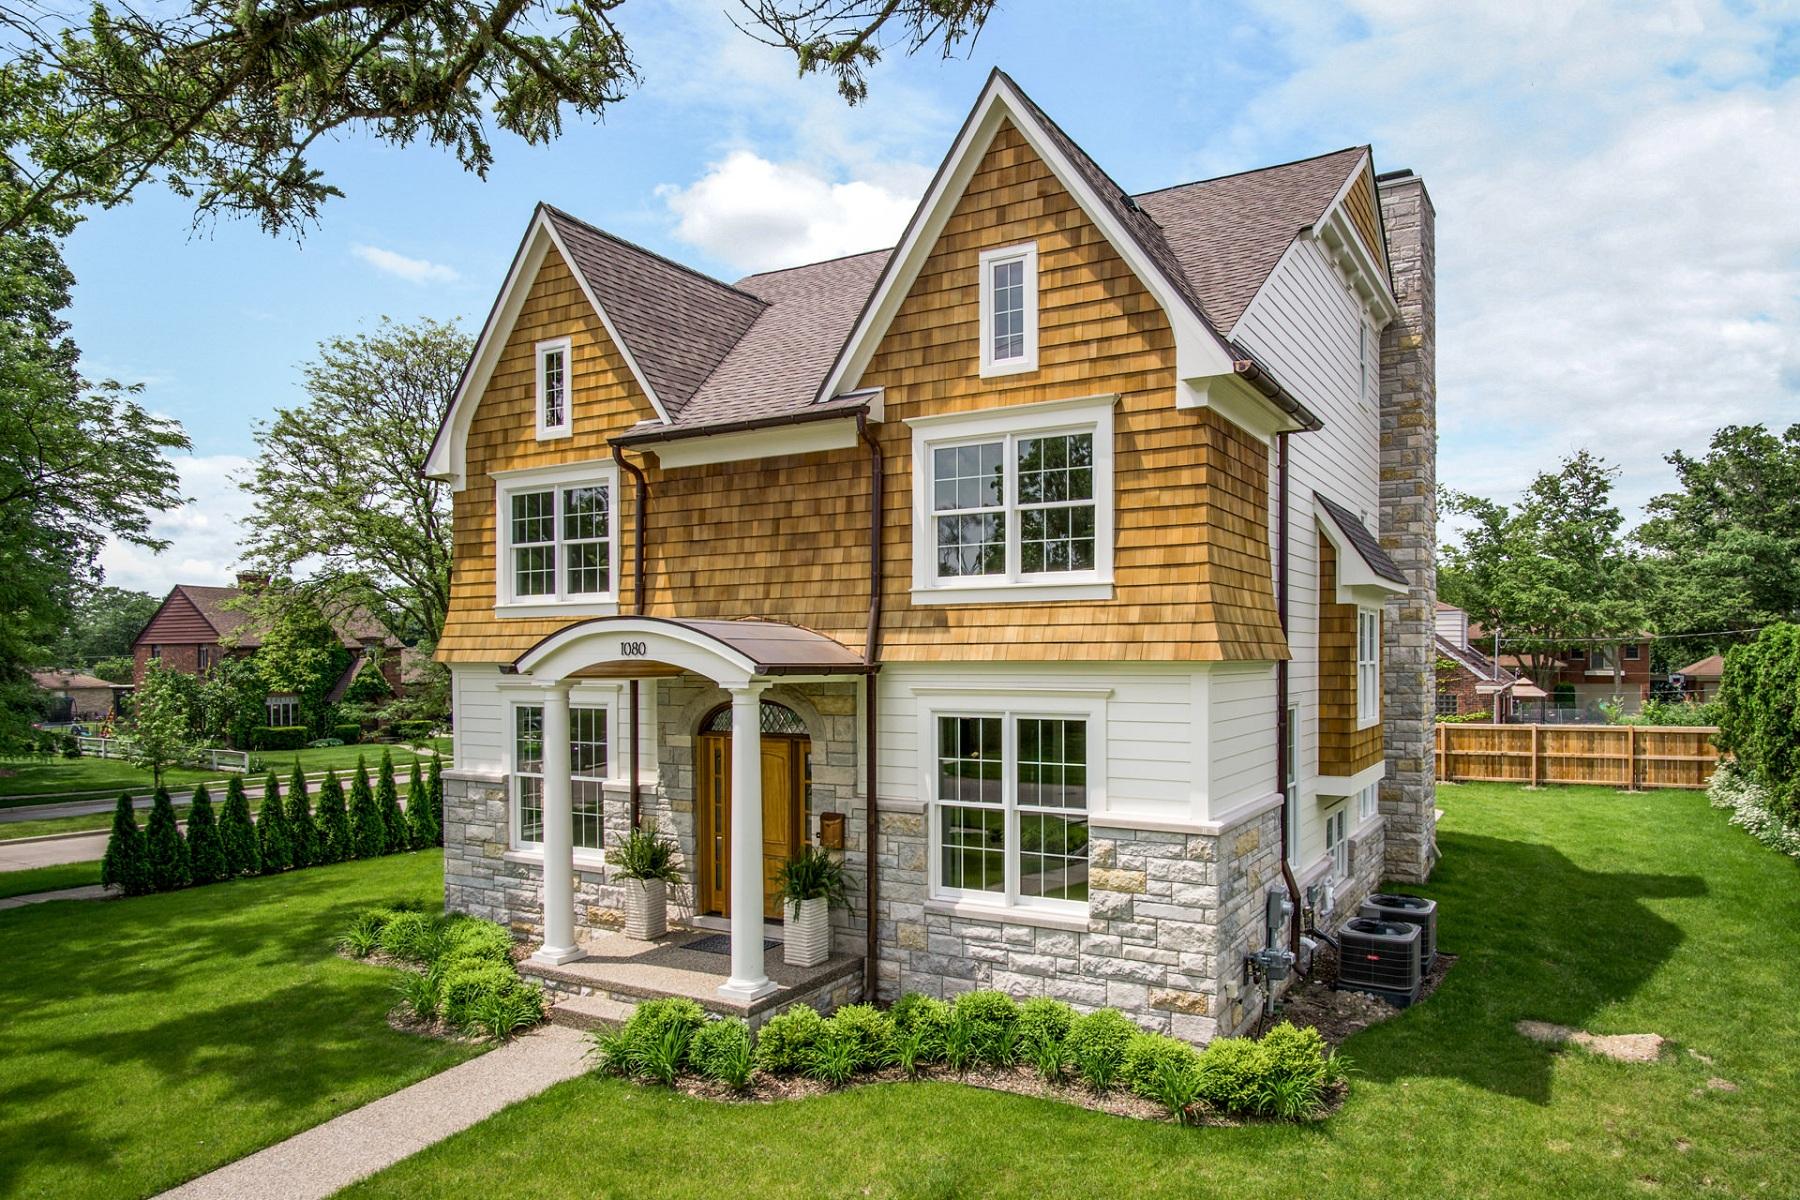 Single Family Homes for Active at Birmingham 1080 Pleasant Street Birmingham, Michigan 48009 United States